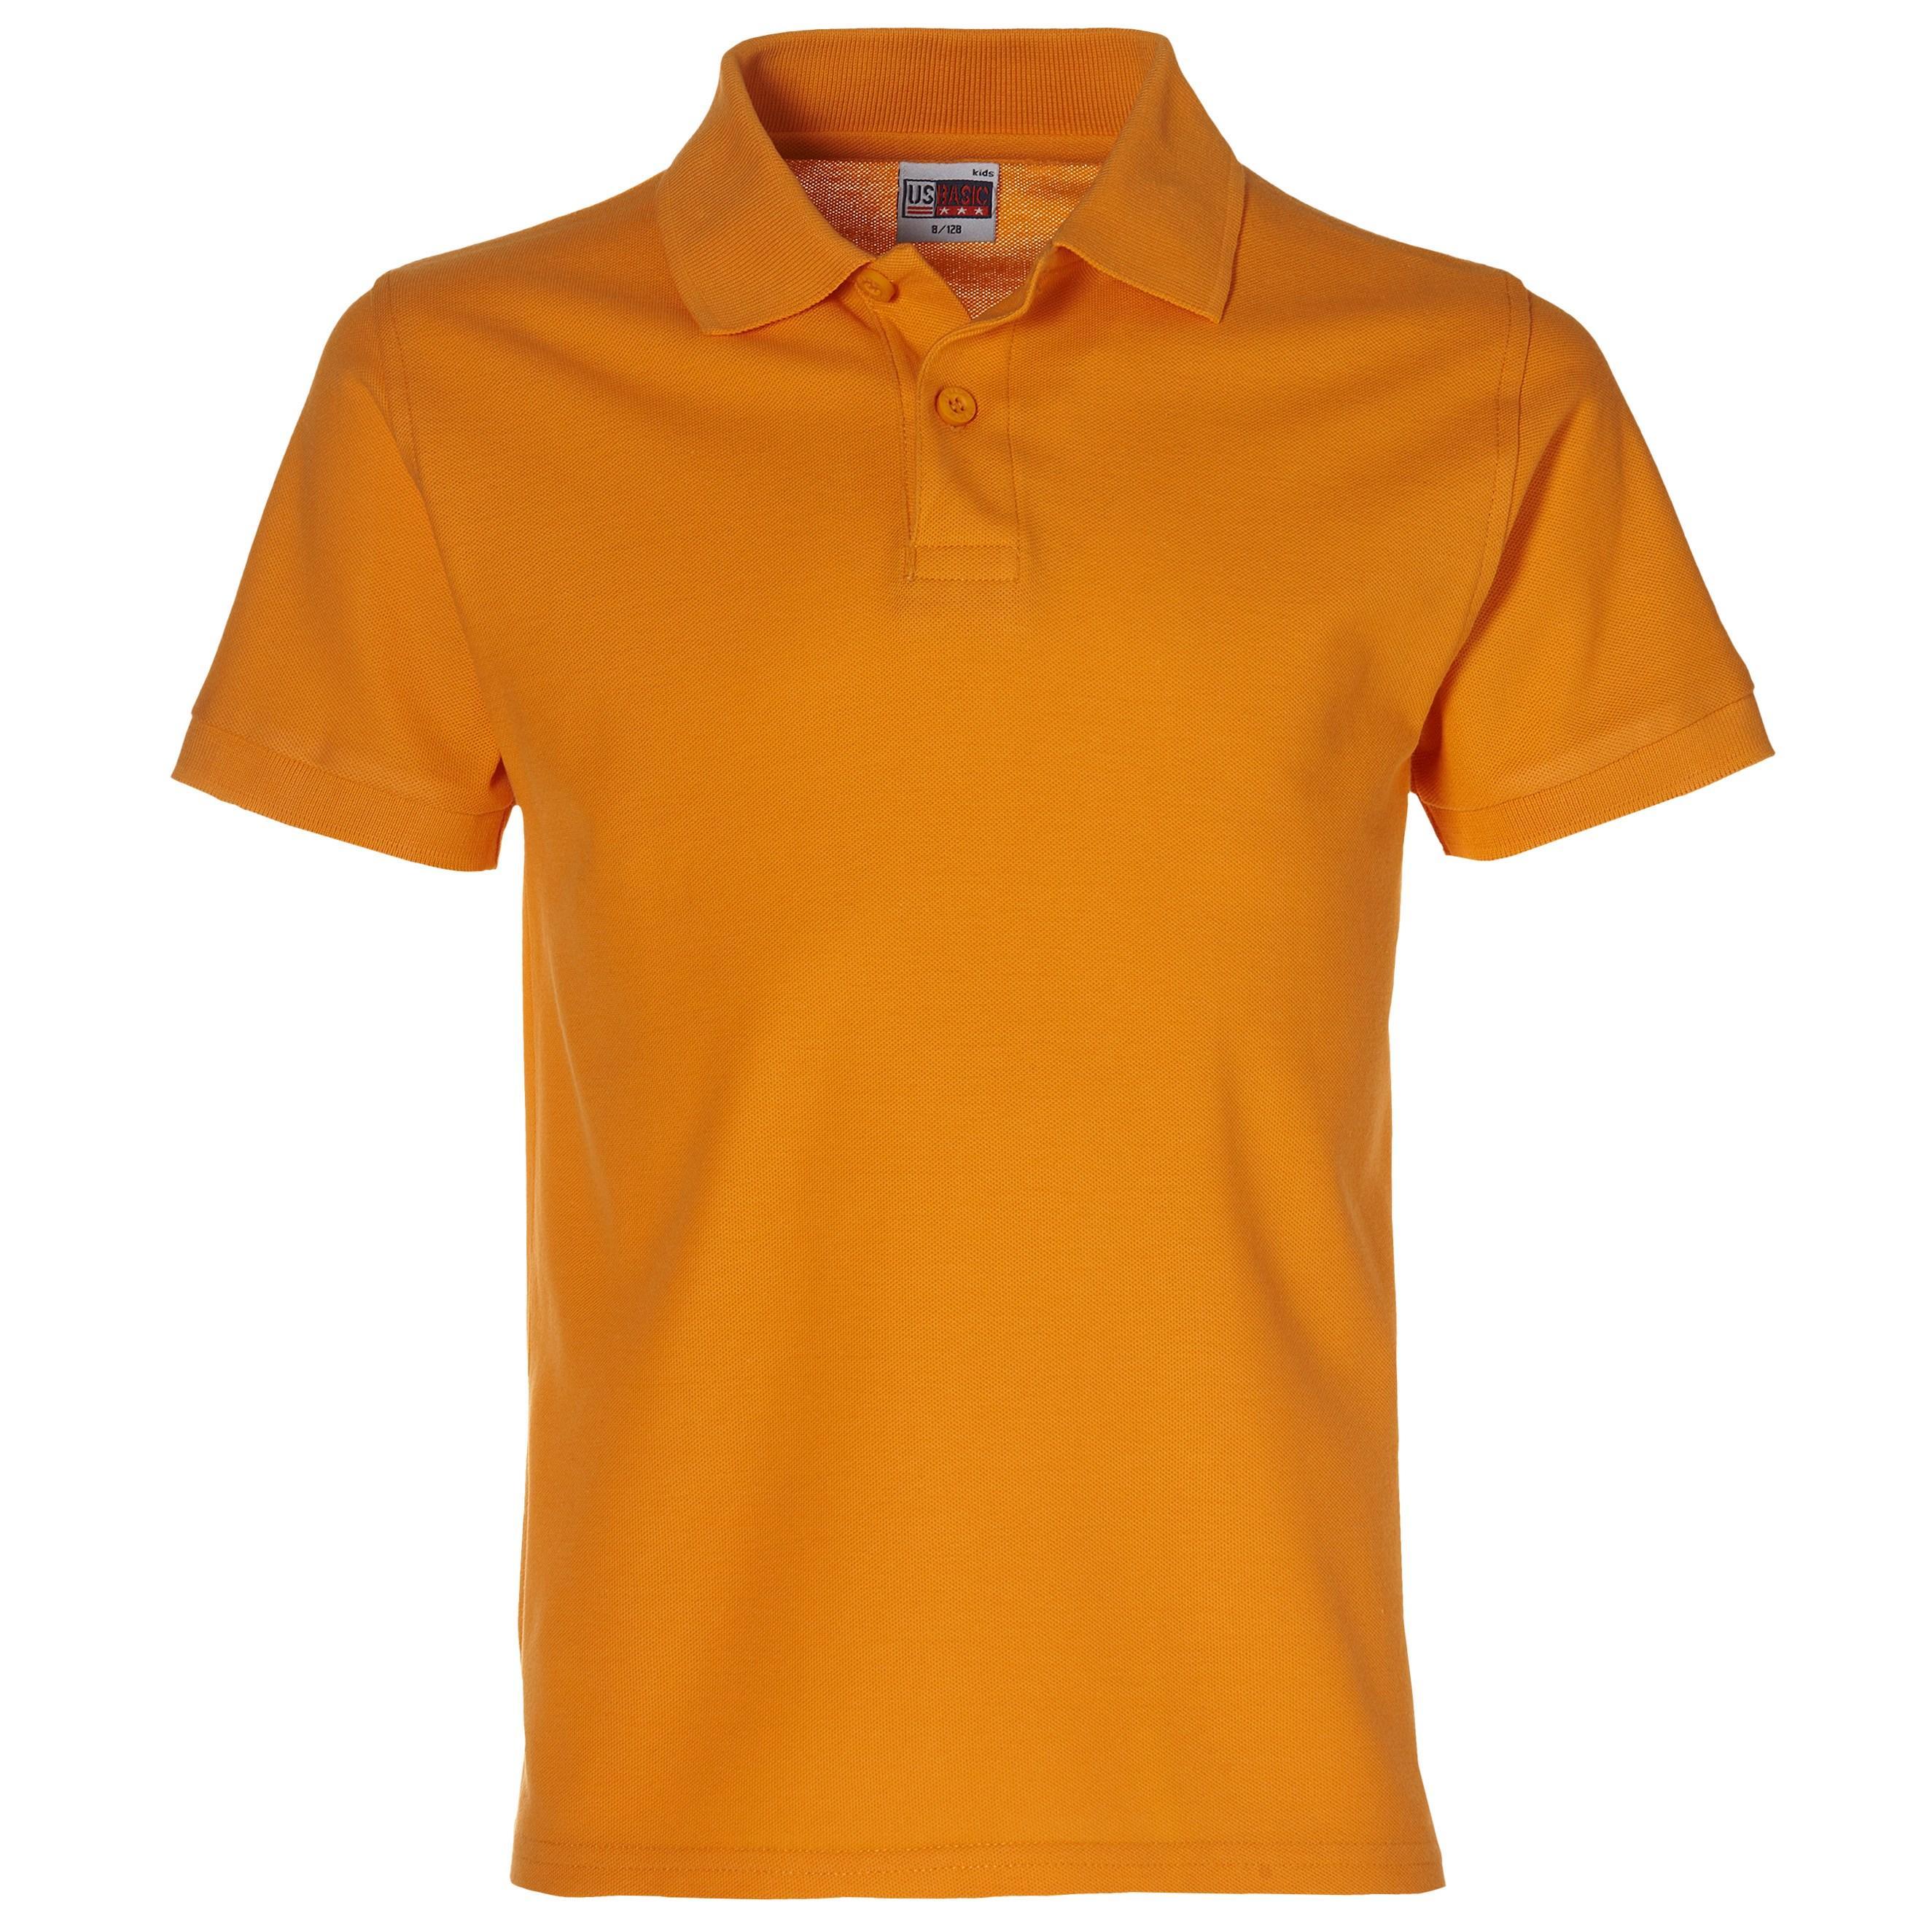 Boston Kids Golf Shirt - Orange Only